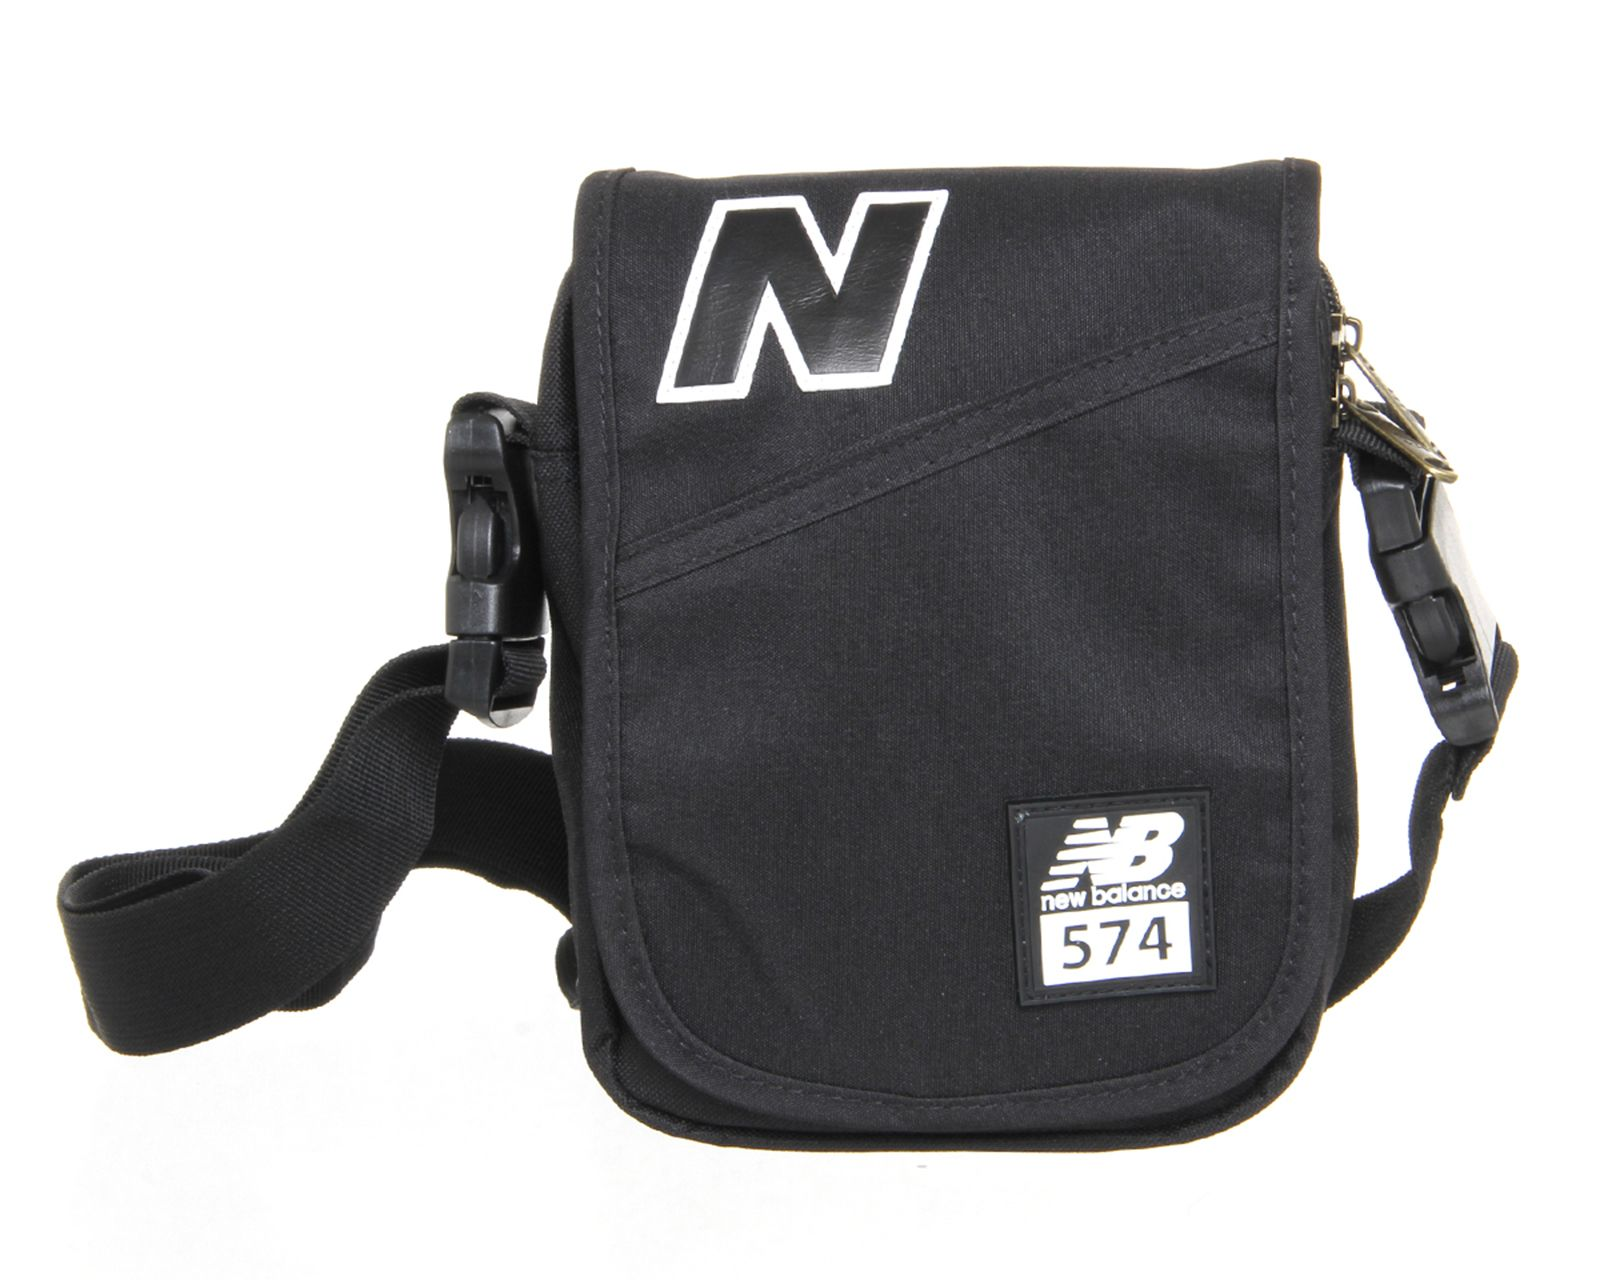 102beba87d30b New Balance New Balance 574 Small Items Bag Black - Backpacks ...